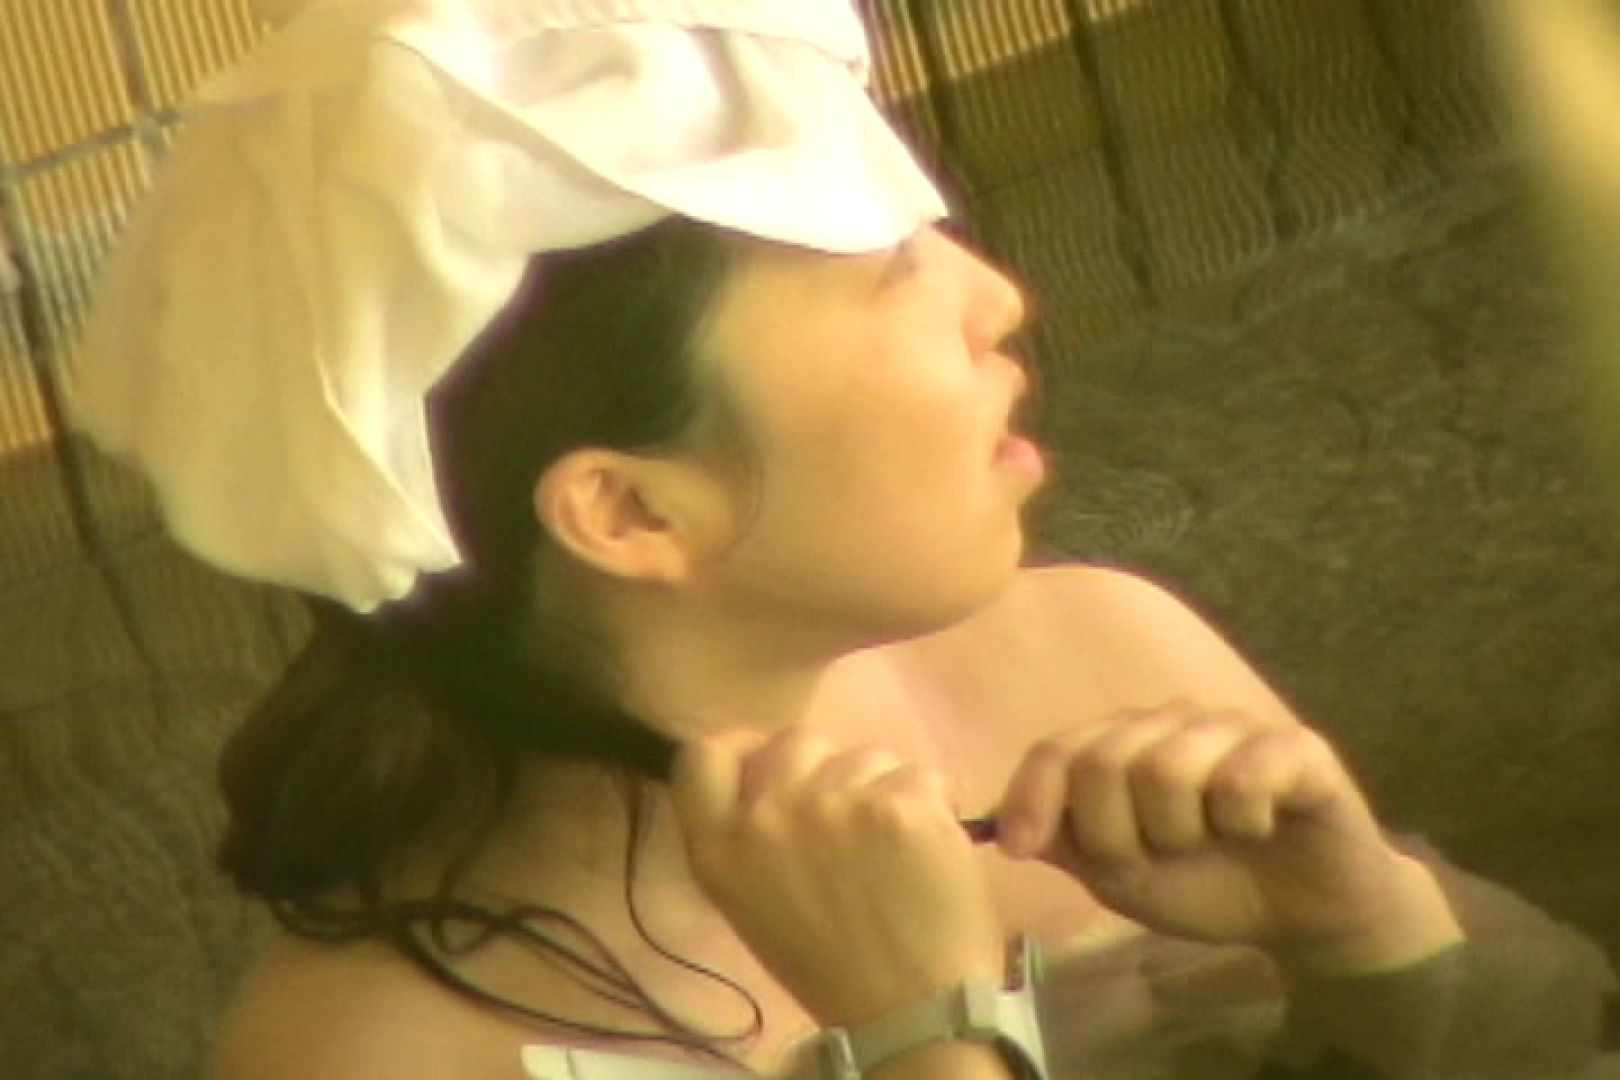 No.8 顔そっくりな女市女末 お女市さんのどす黒い突起物に注目! 巨乳  68PIX 63